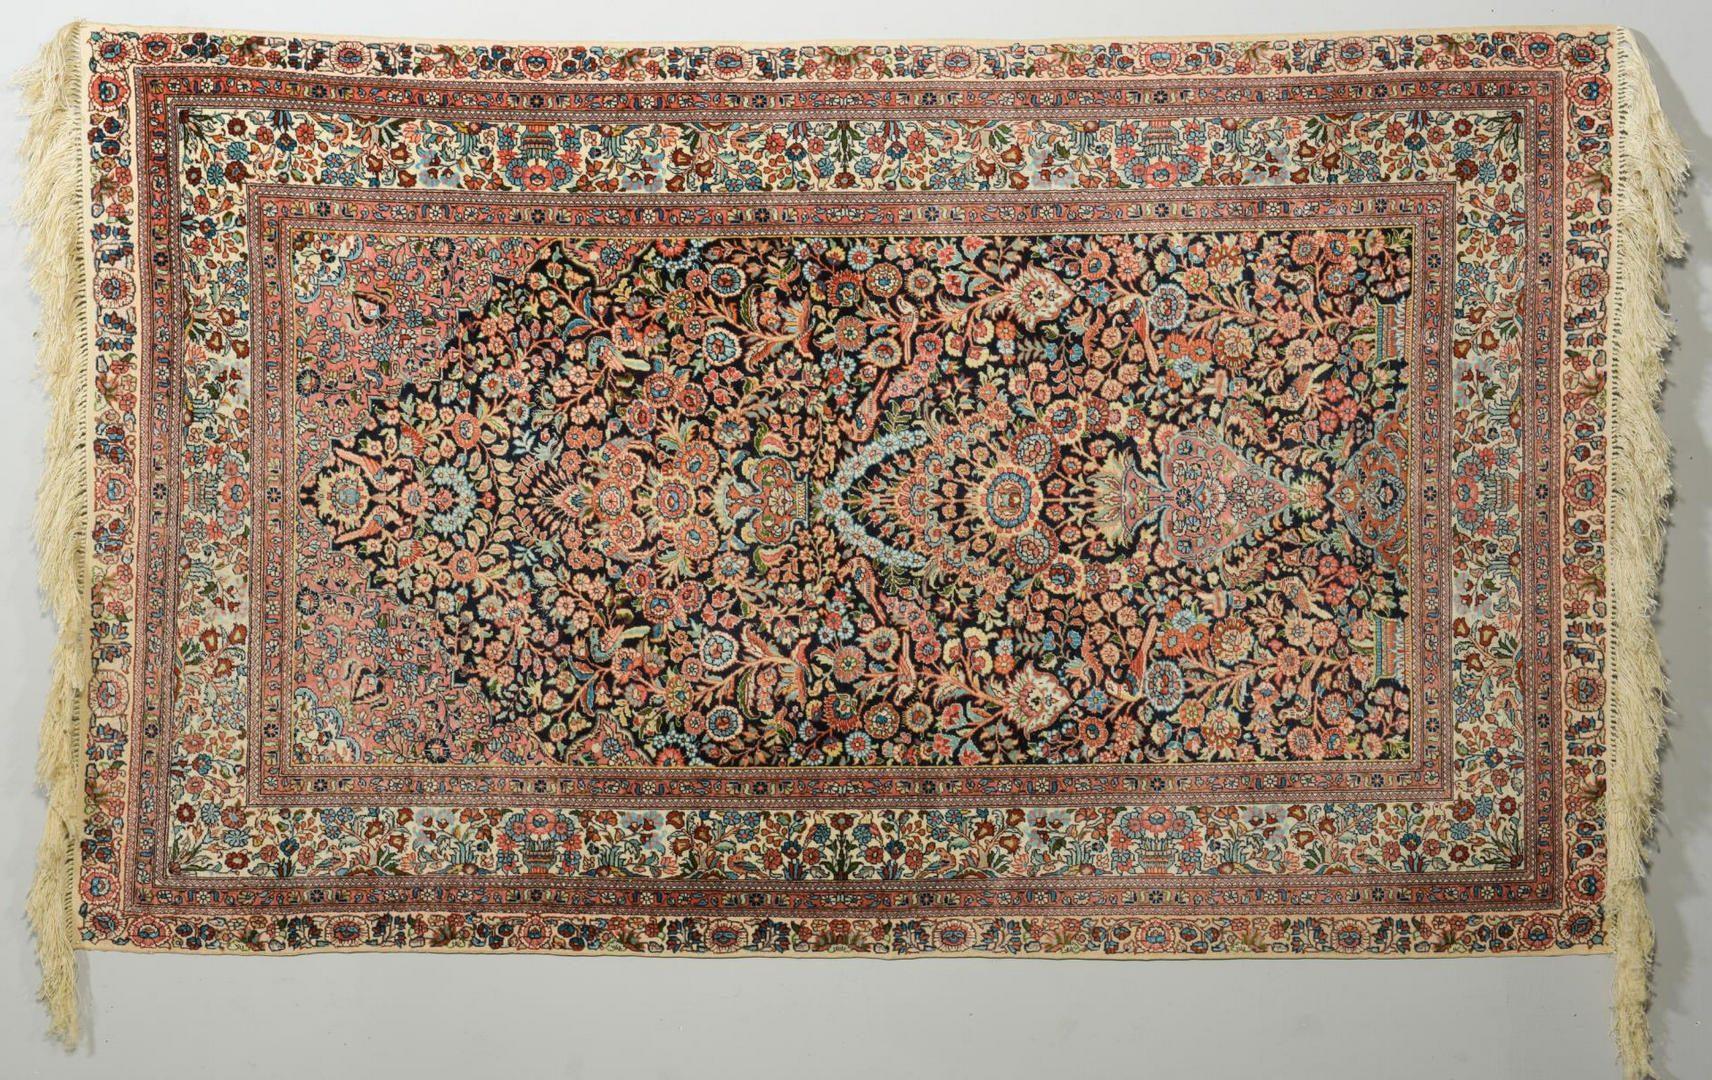 Lot 228: Silk Hereke Carpet, Tree of Life